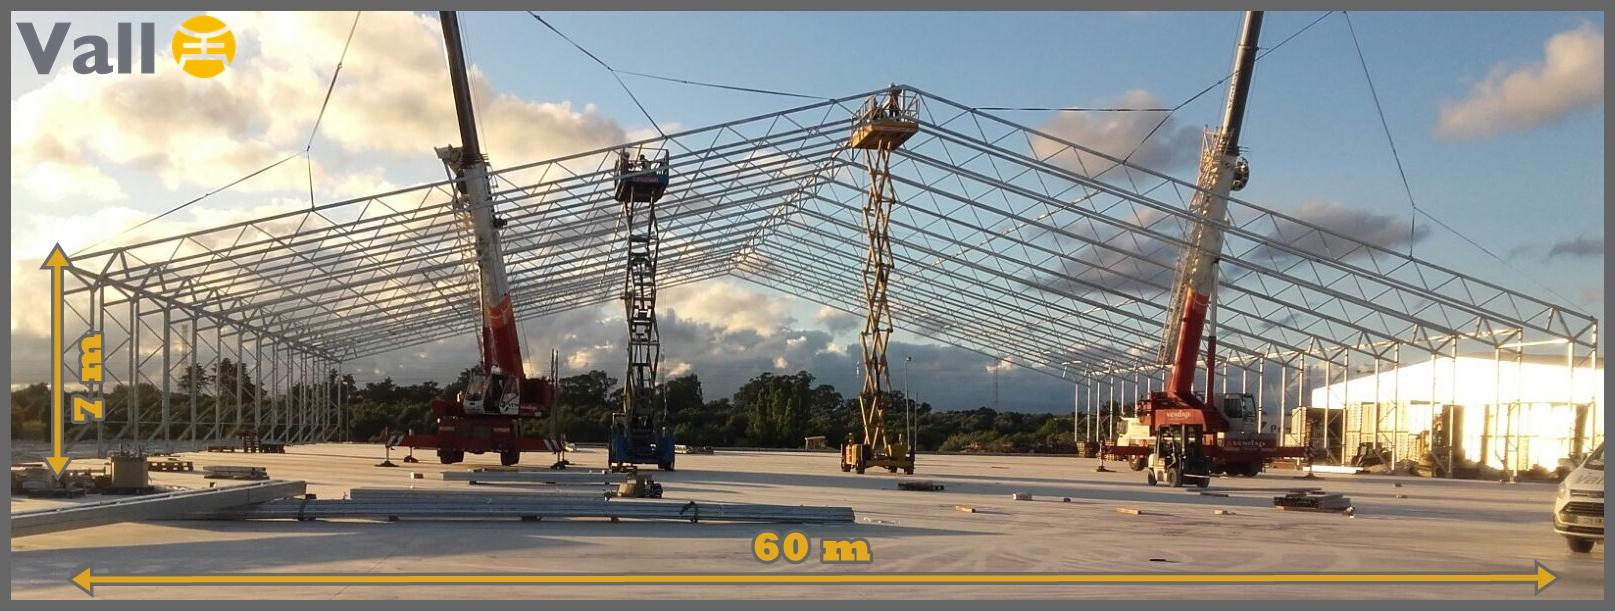 Hangar démontable MEGA-STOCK